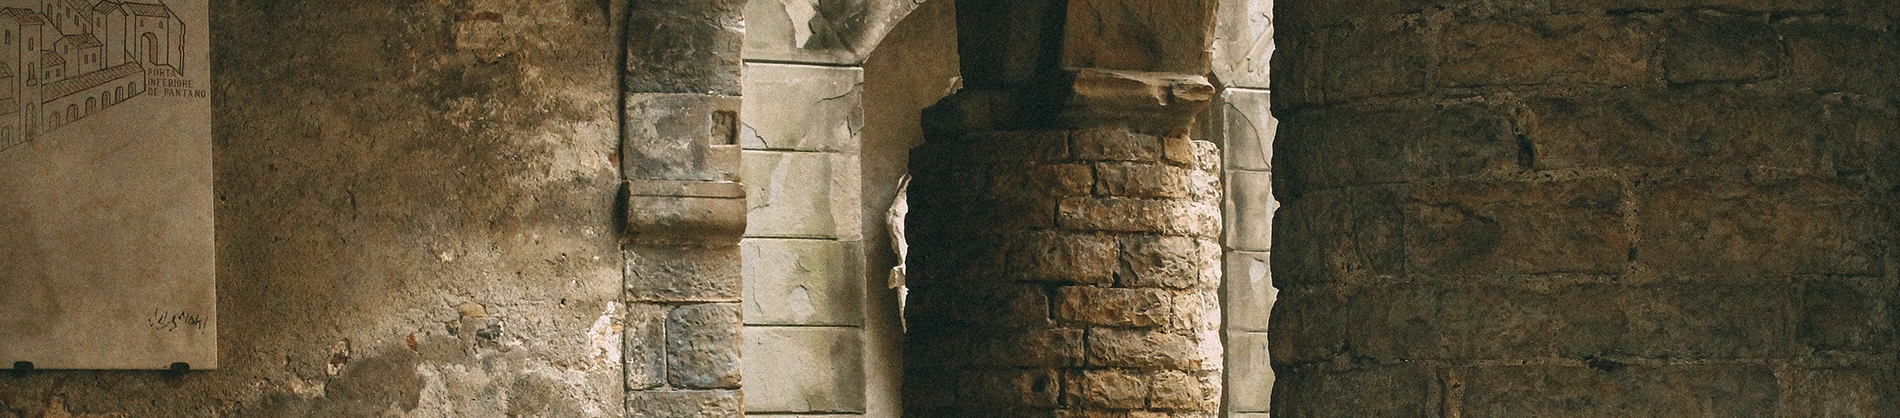 Inside of a church, brick walls and large brick columns